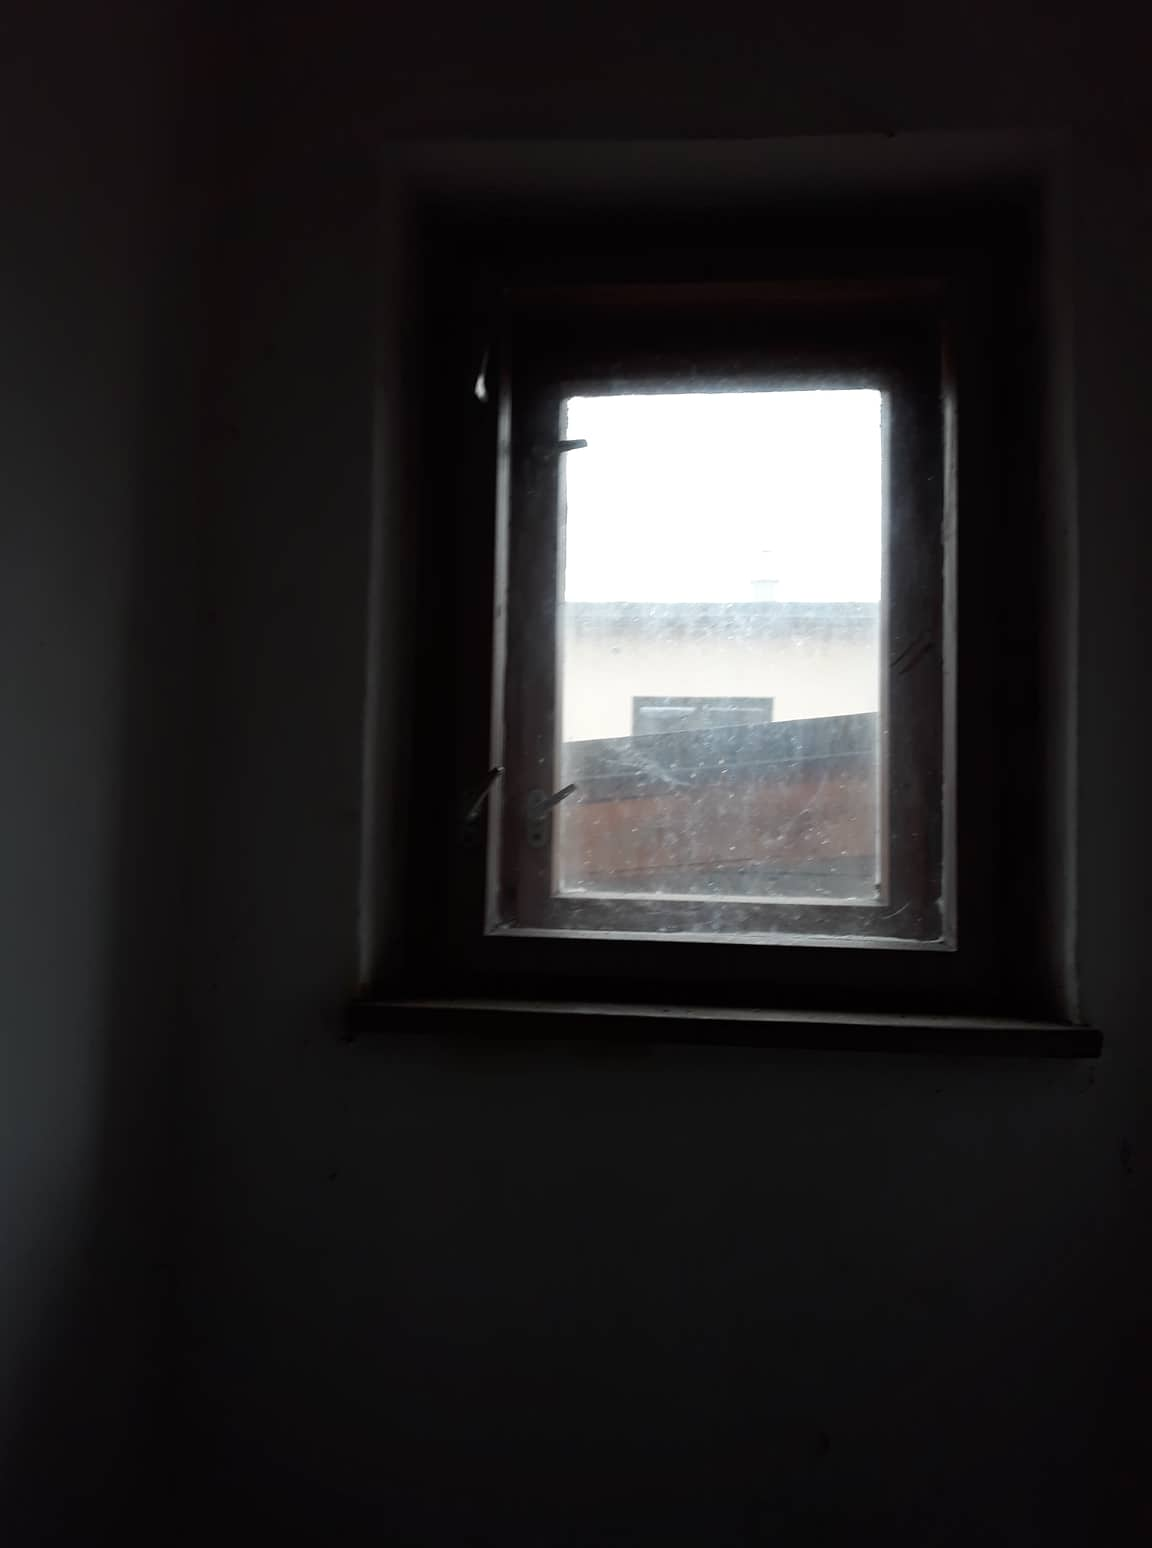 Rekonštrukcia domu-alebo chceme si splniť sen =》🏠🌻🌼🐶  mat domcek a vratit sa na Slovensko - okno v kupelni